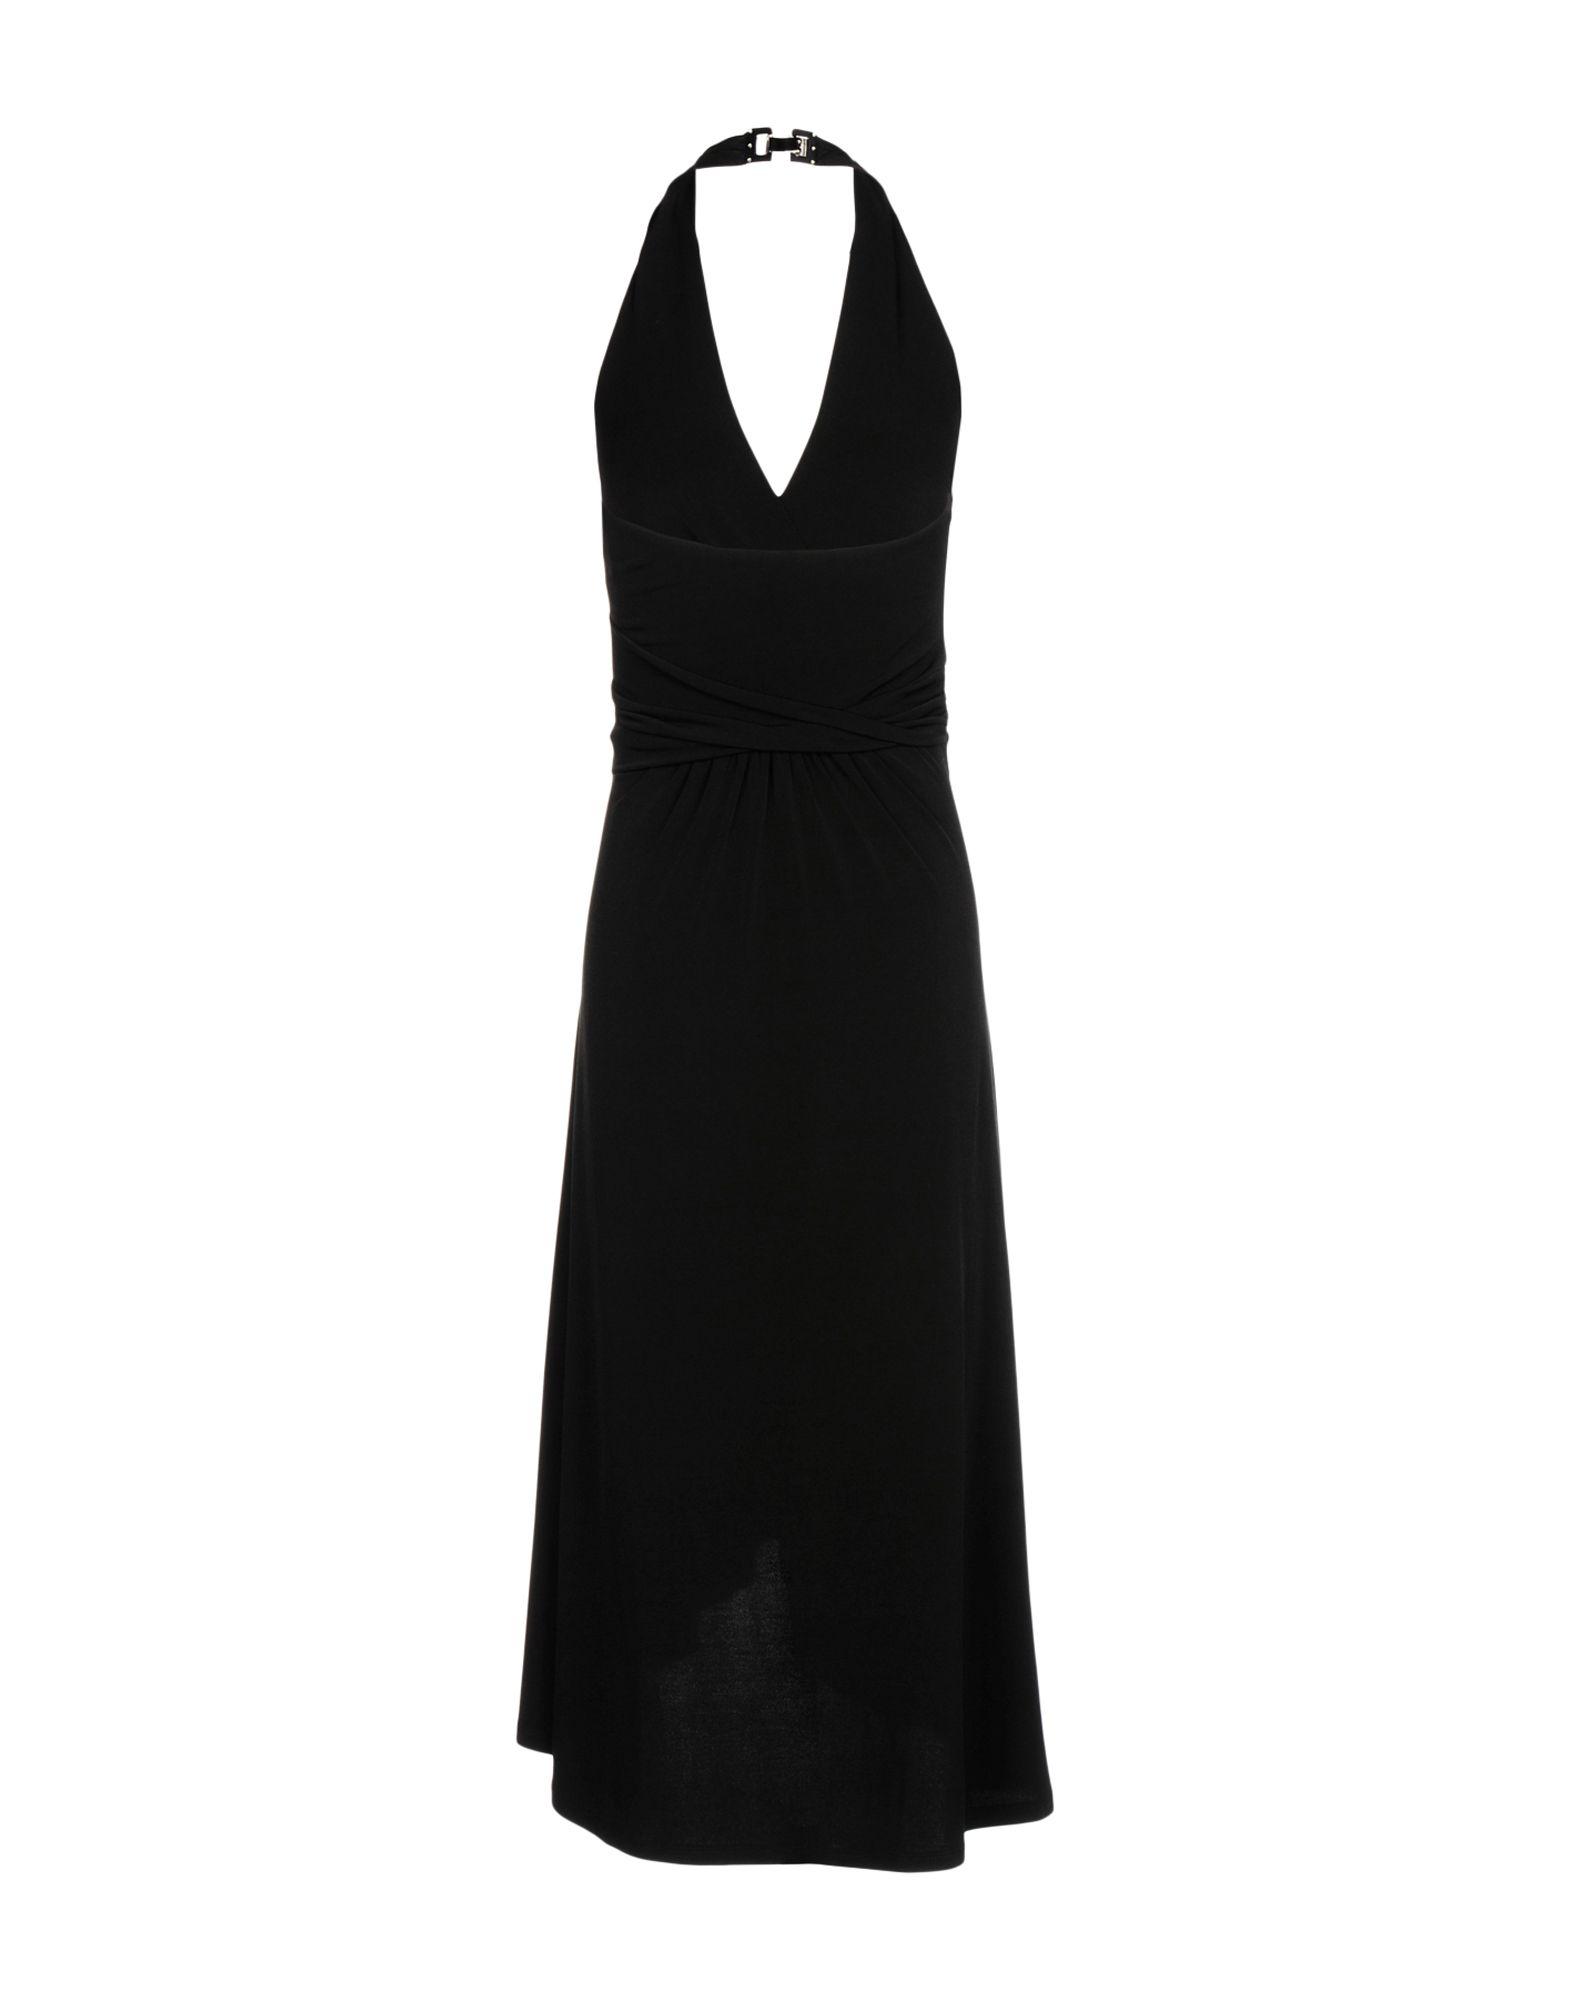 Micheal kors black dress2